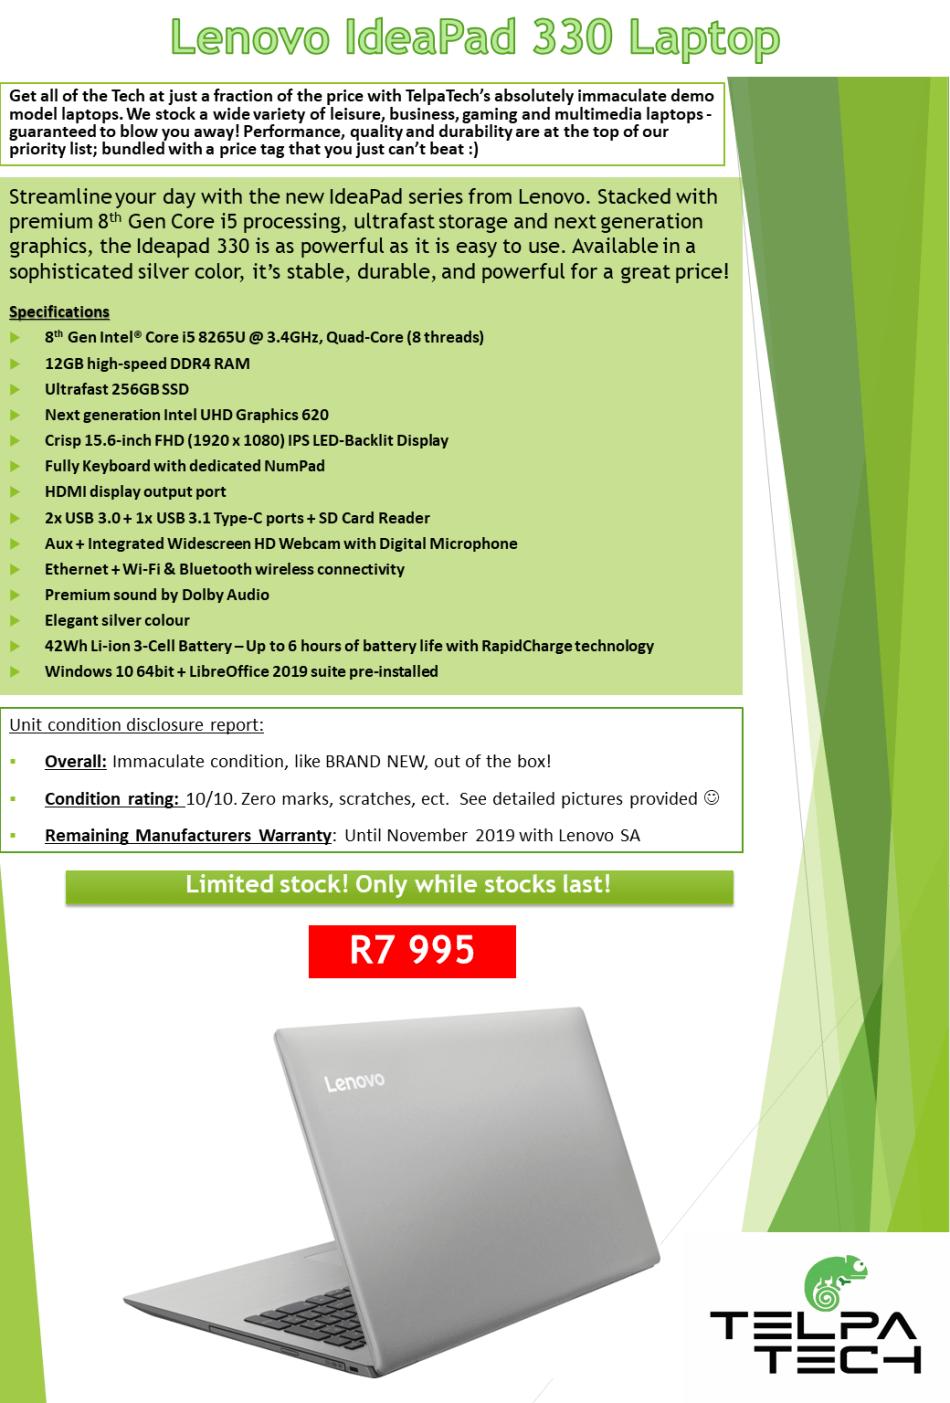 Laptops & Notebooks - Lenovo IdeaPad 330 **8th Gen Core i5, 12GB RAM